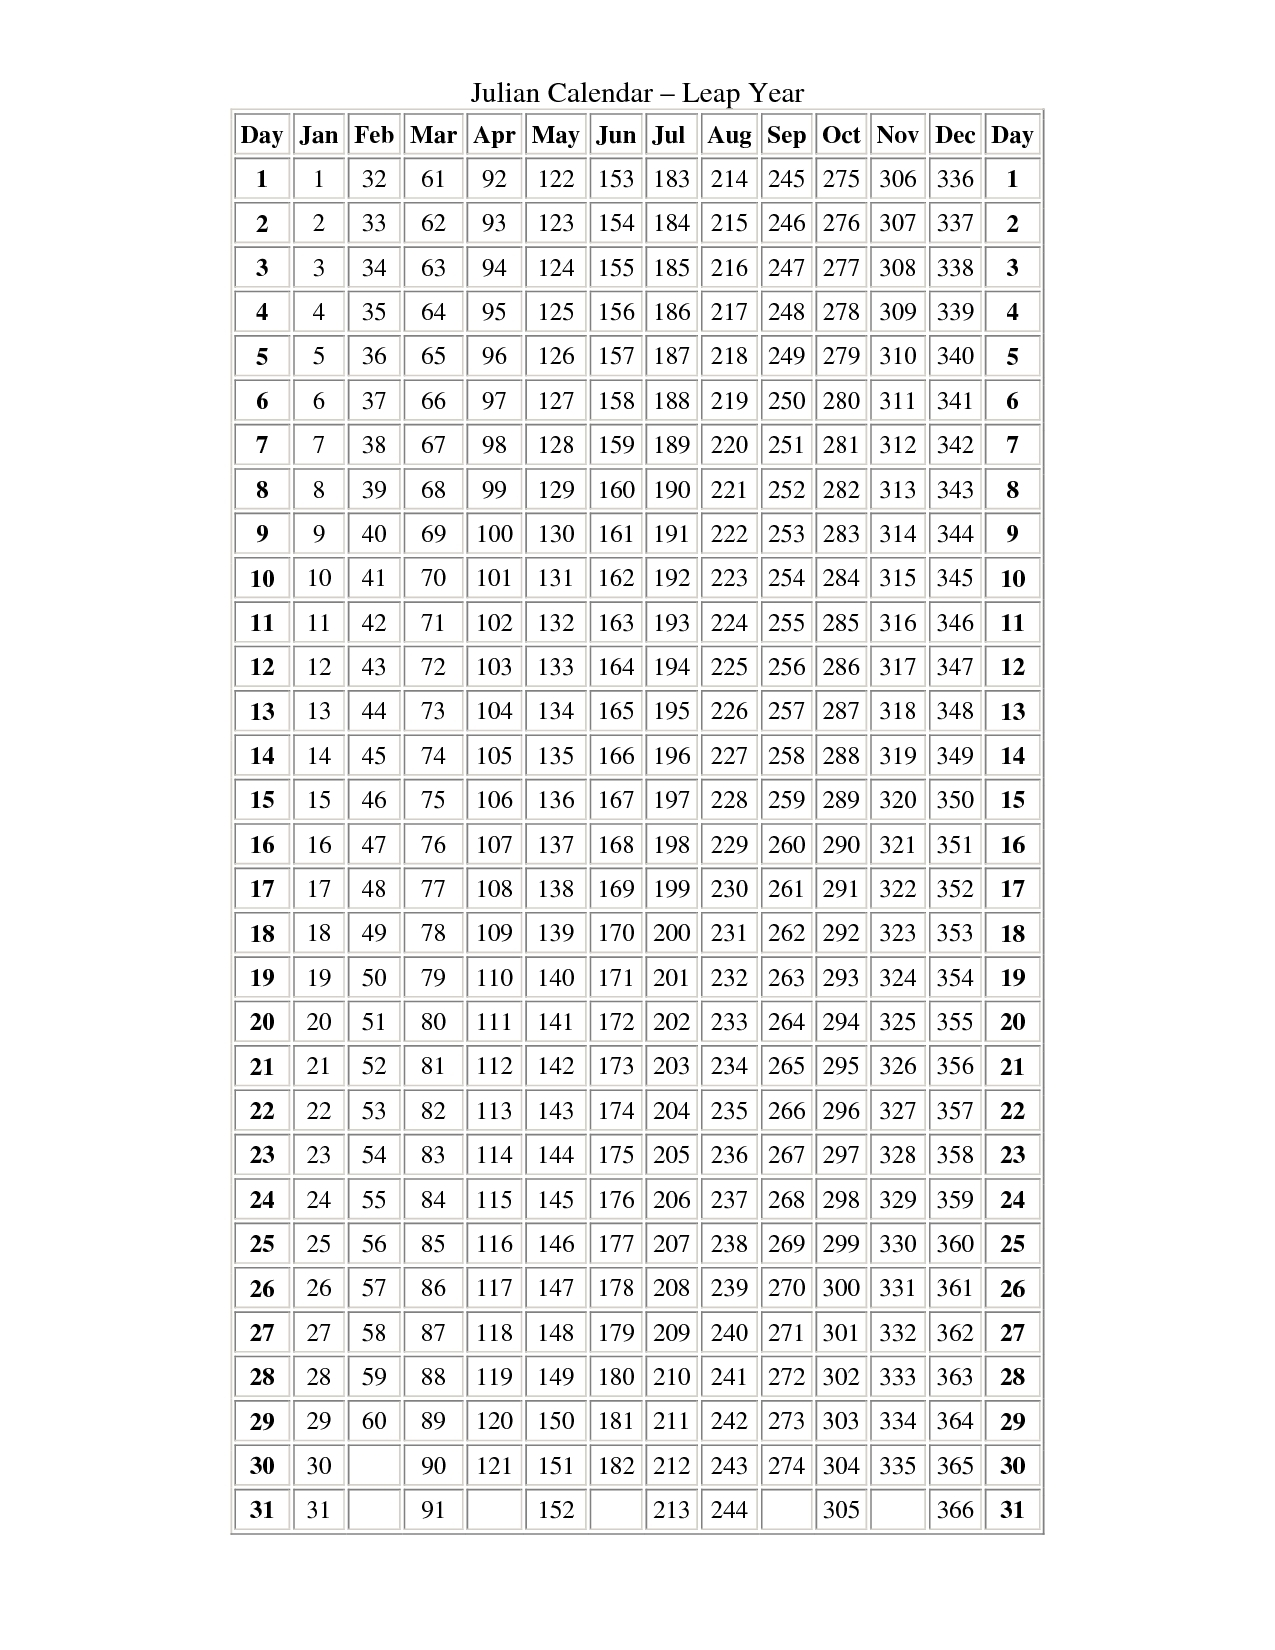 Julian Date Calendar For Non Leap Year | Template Calendar Printable for Day Of Year Calendar Leap Year Non Leap Year